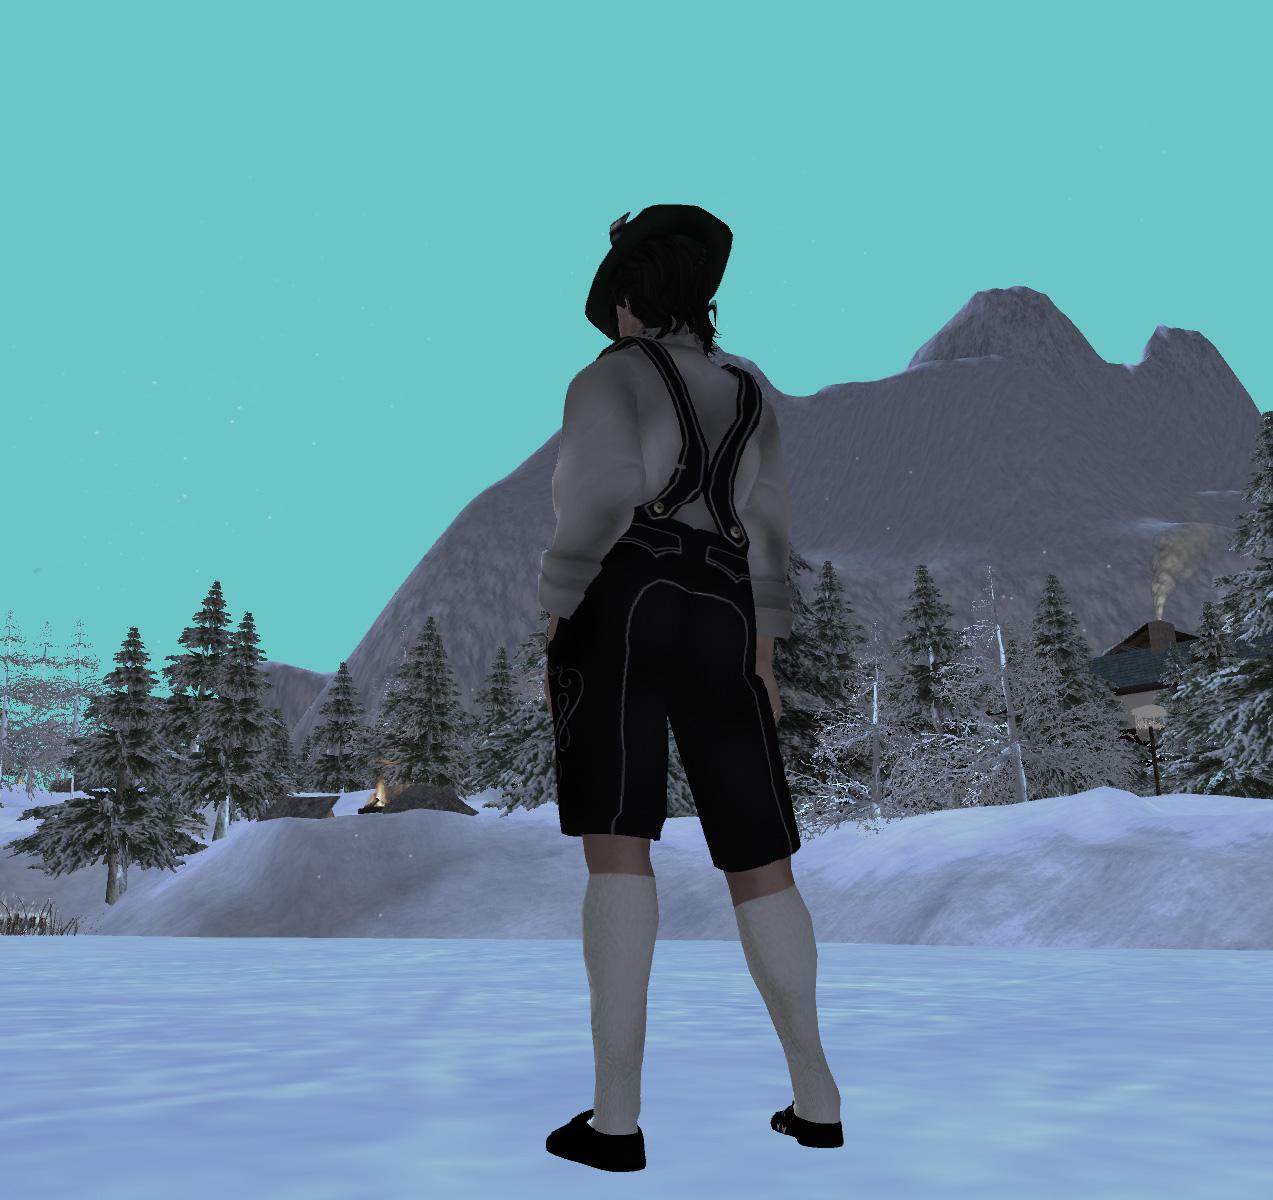 AVatar-Bizarre-Lederhosen-in-the-Snow-II